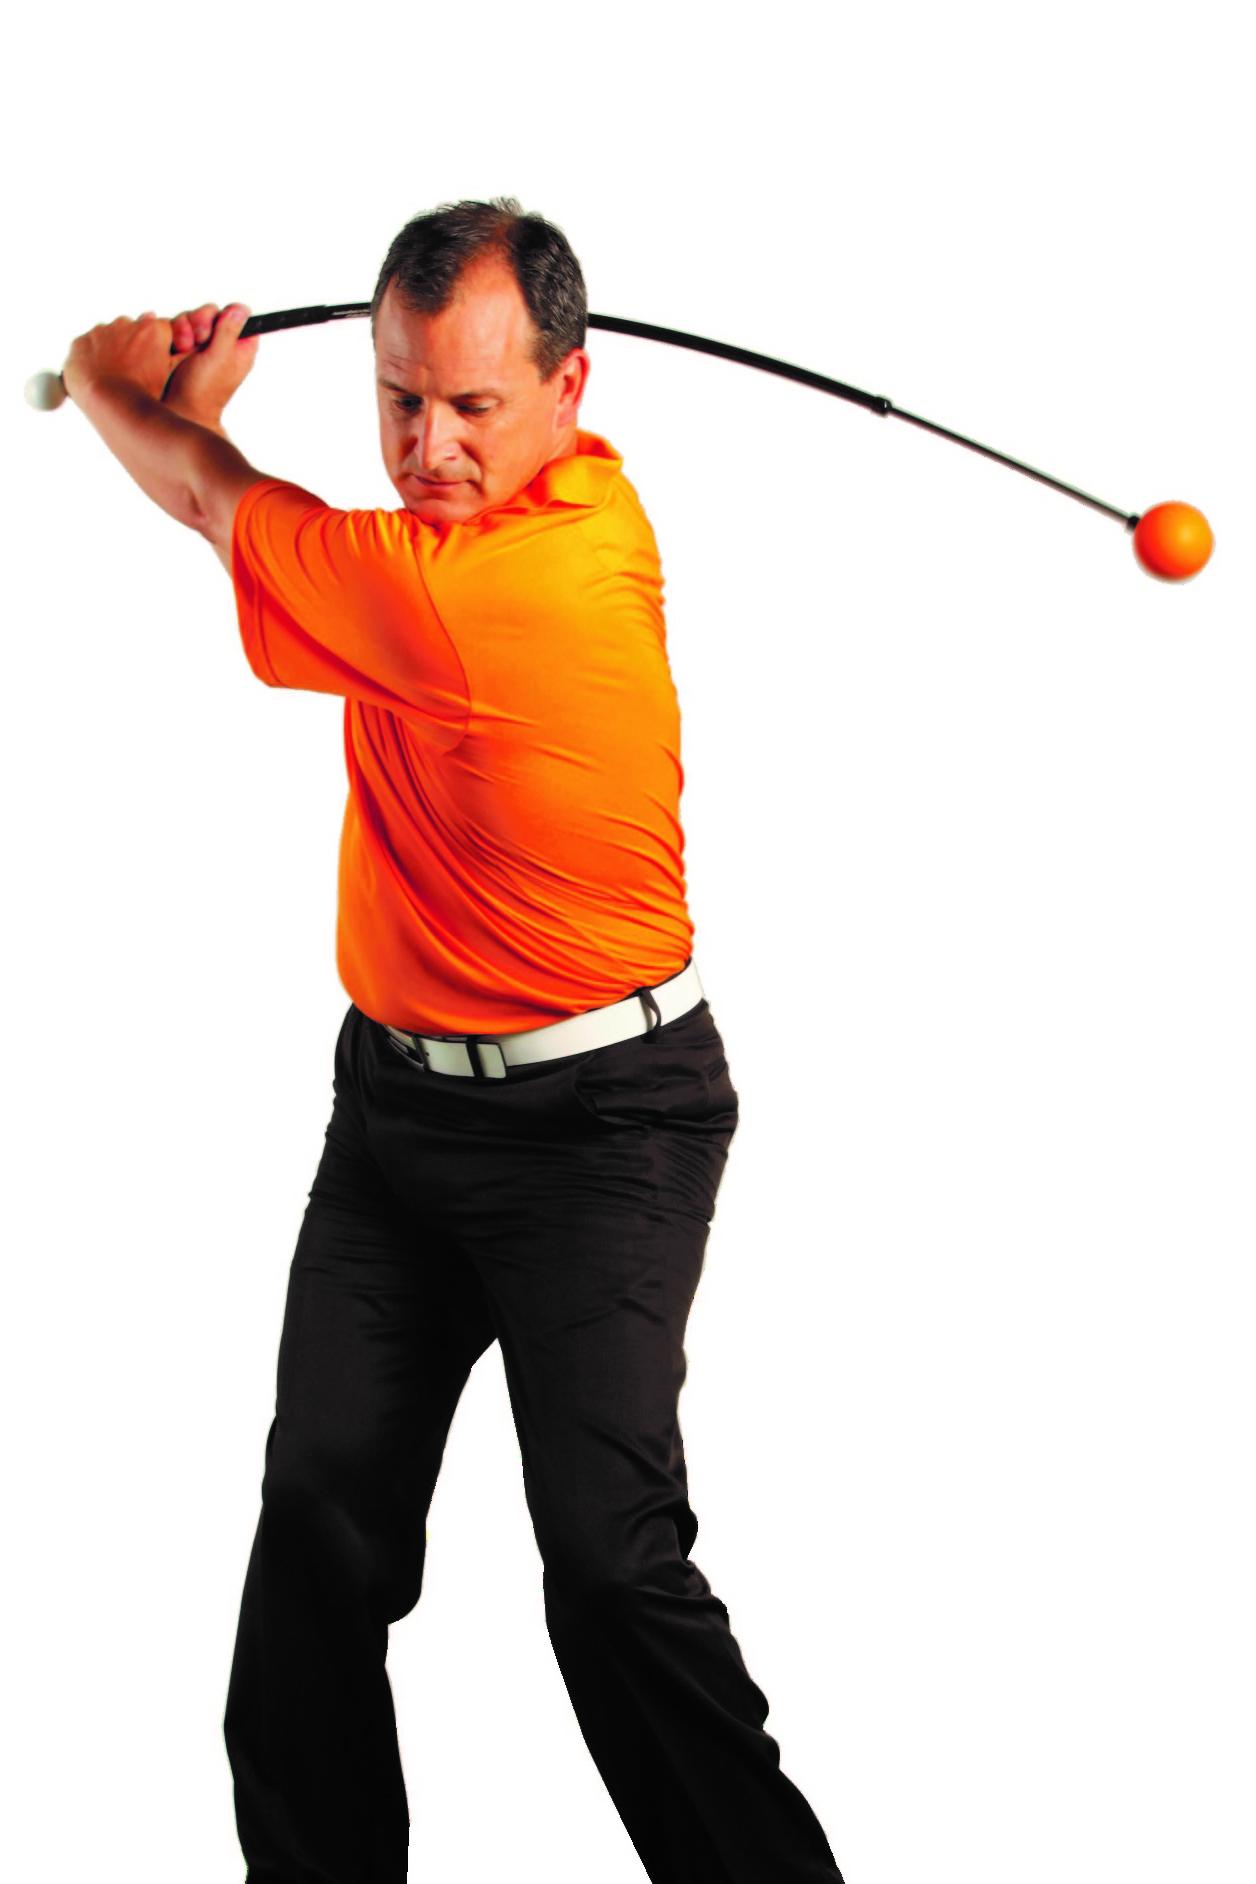 6 golf